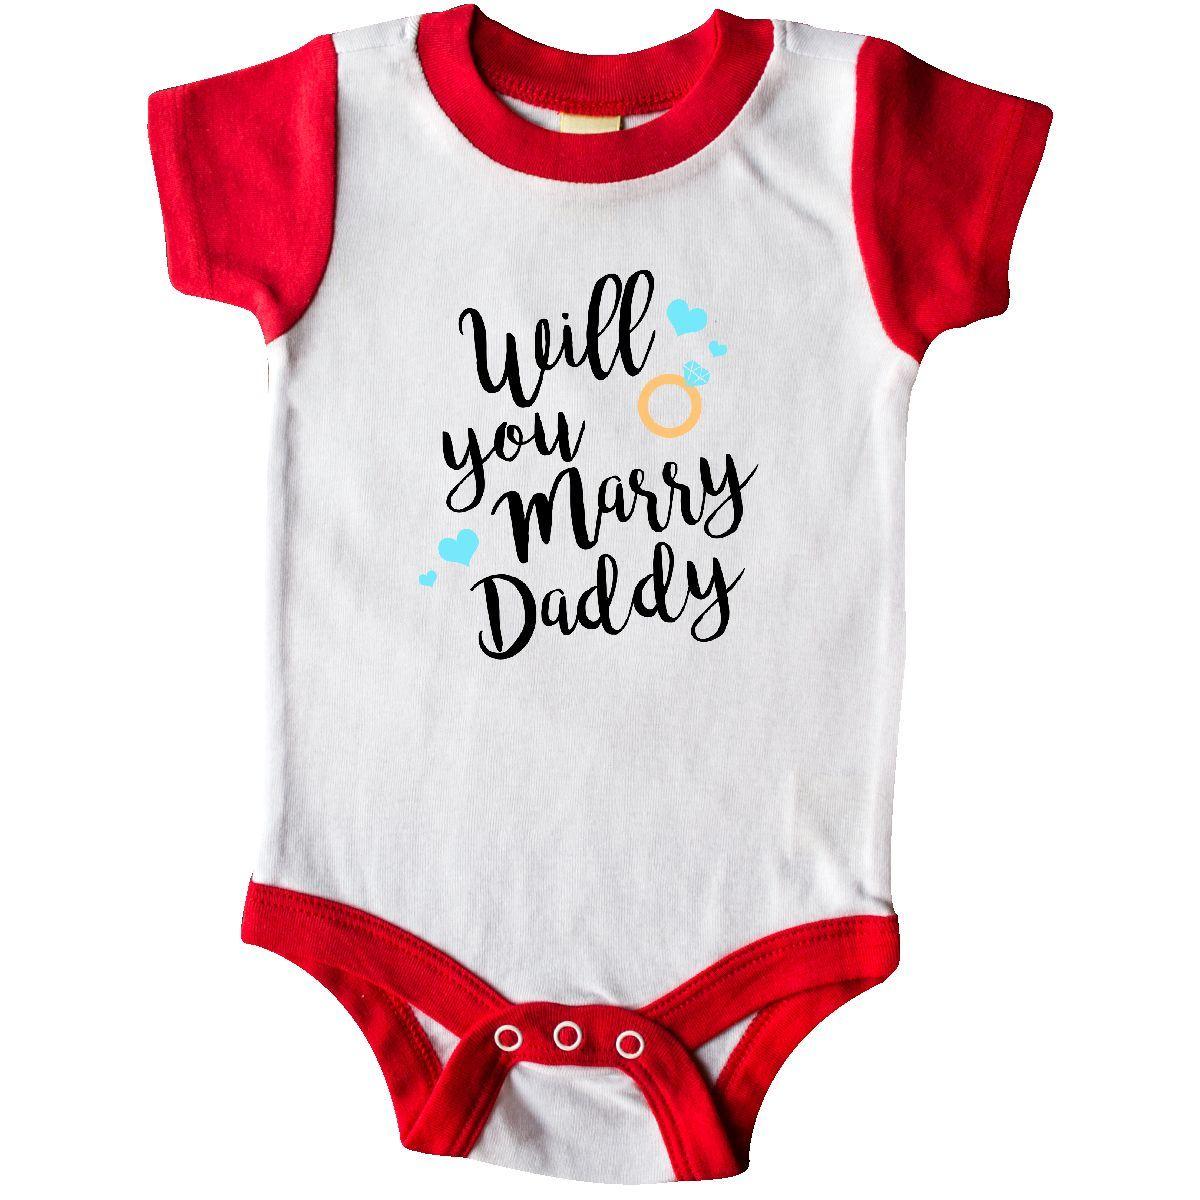 Fryhyu8 Baby Girls Kids Turtle Lover Printed Long Sleeve 100/% Cotton Infants Tops